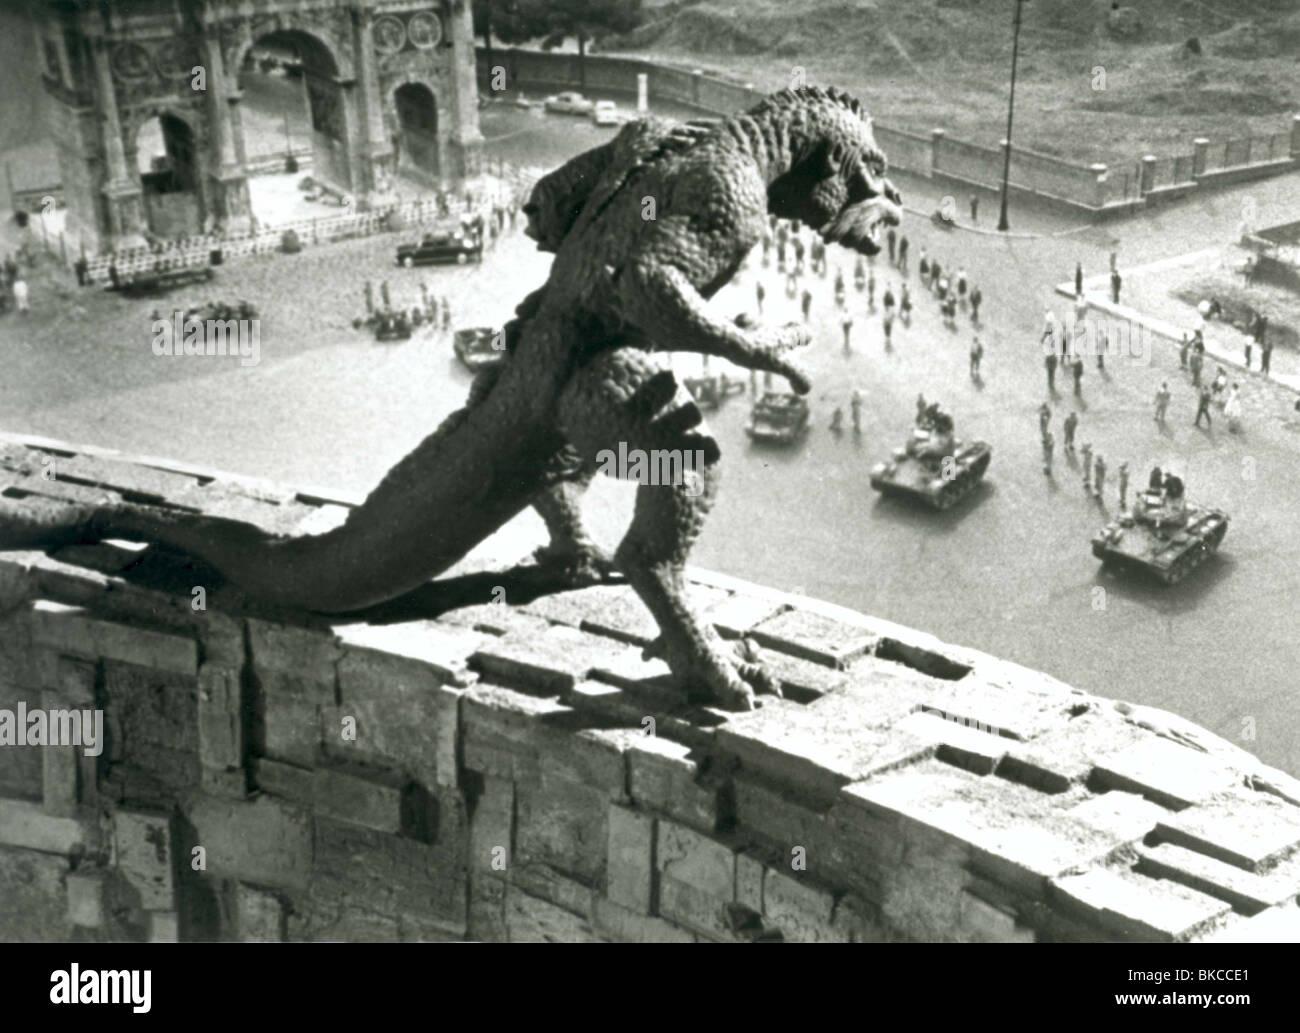 20 MILLIONS DE KILOMÈTRES DE LA TERRE (1957) 001P TWMM Photo Stock